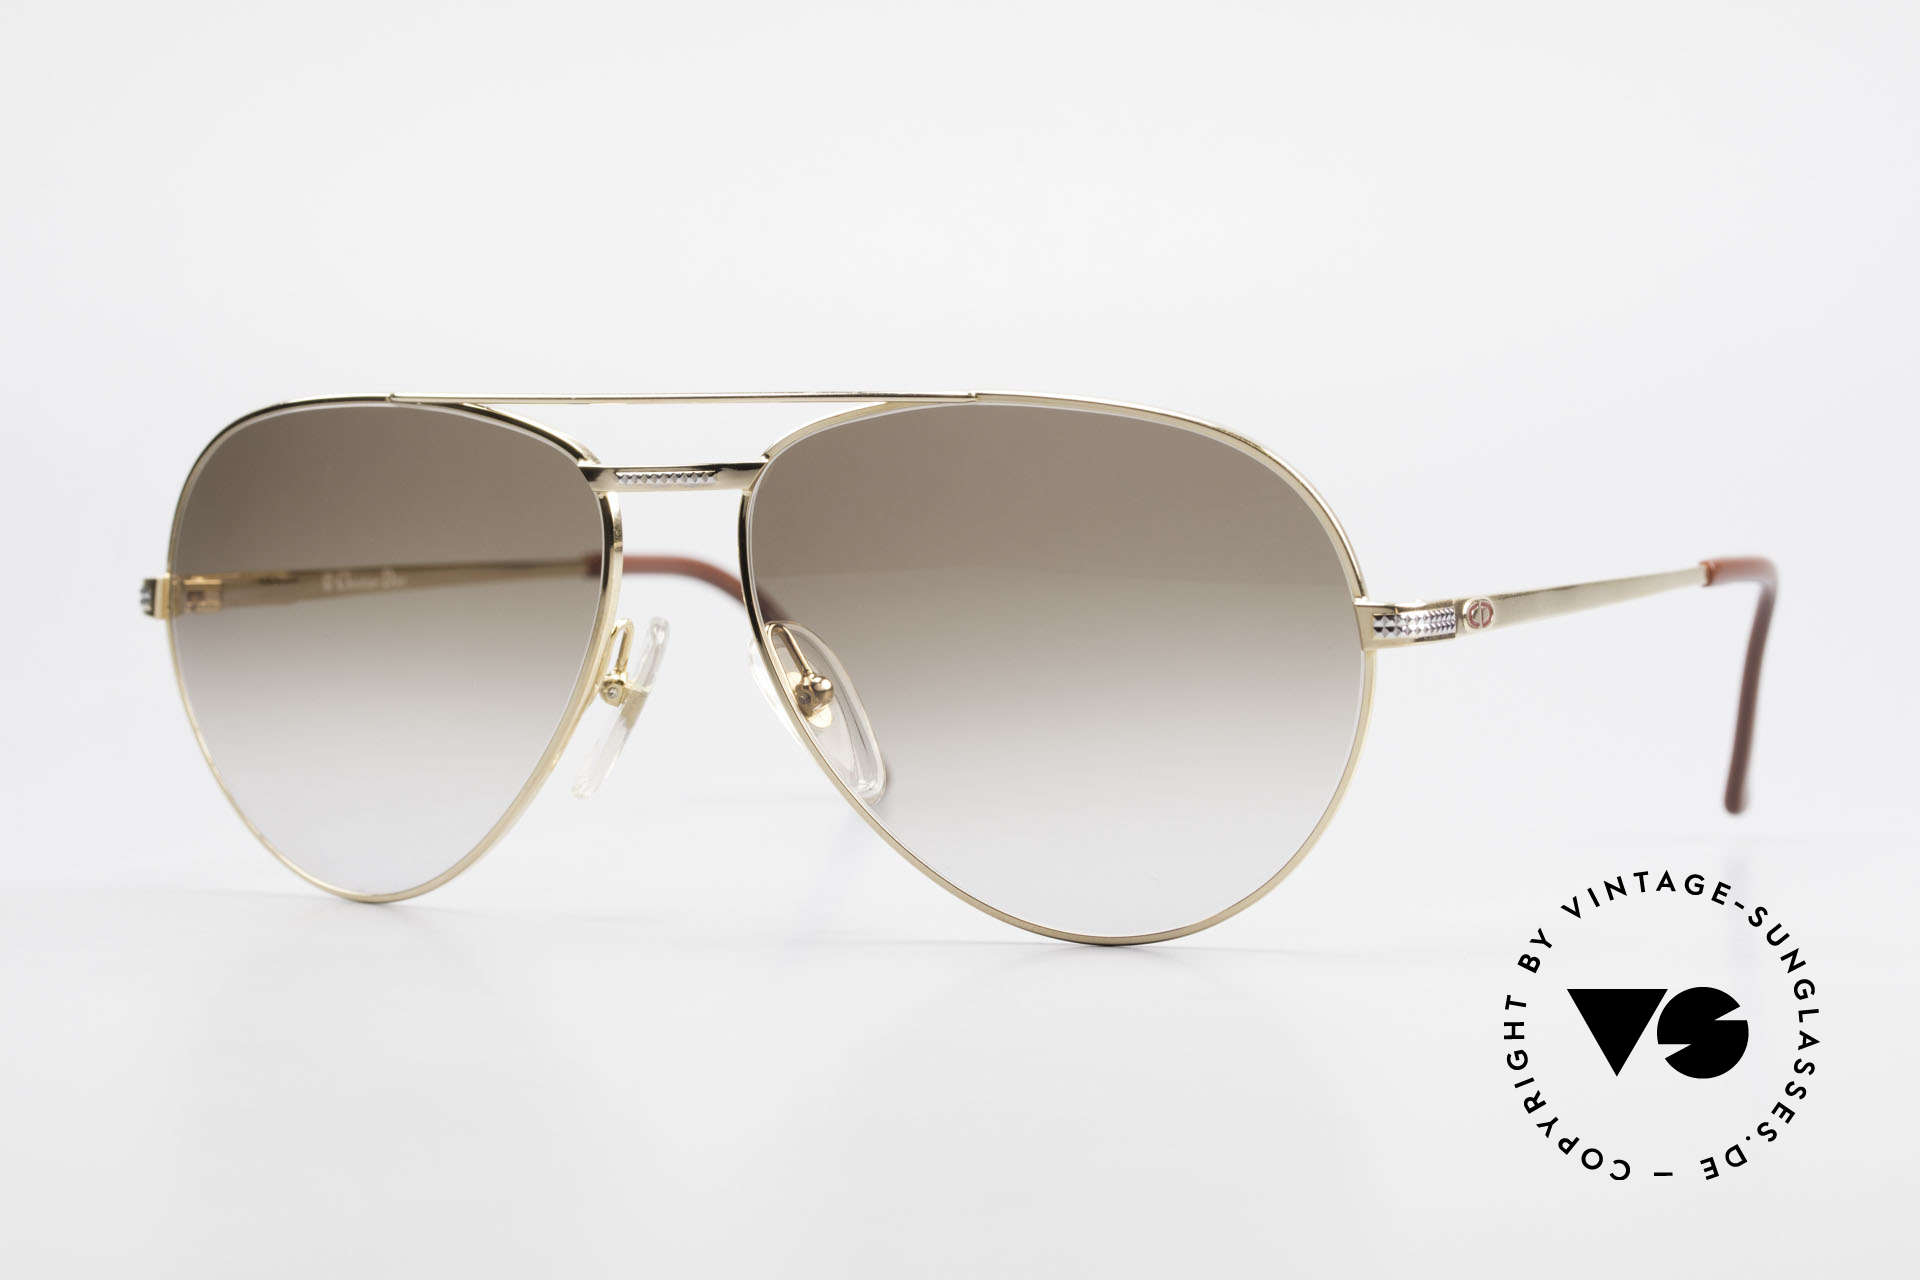 Christian Dior 2780 Gold-Plated 90's Aviator Frame, noble 90's aviator sunglasses by Christian Dior, Made for Men